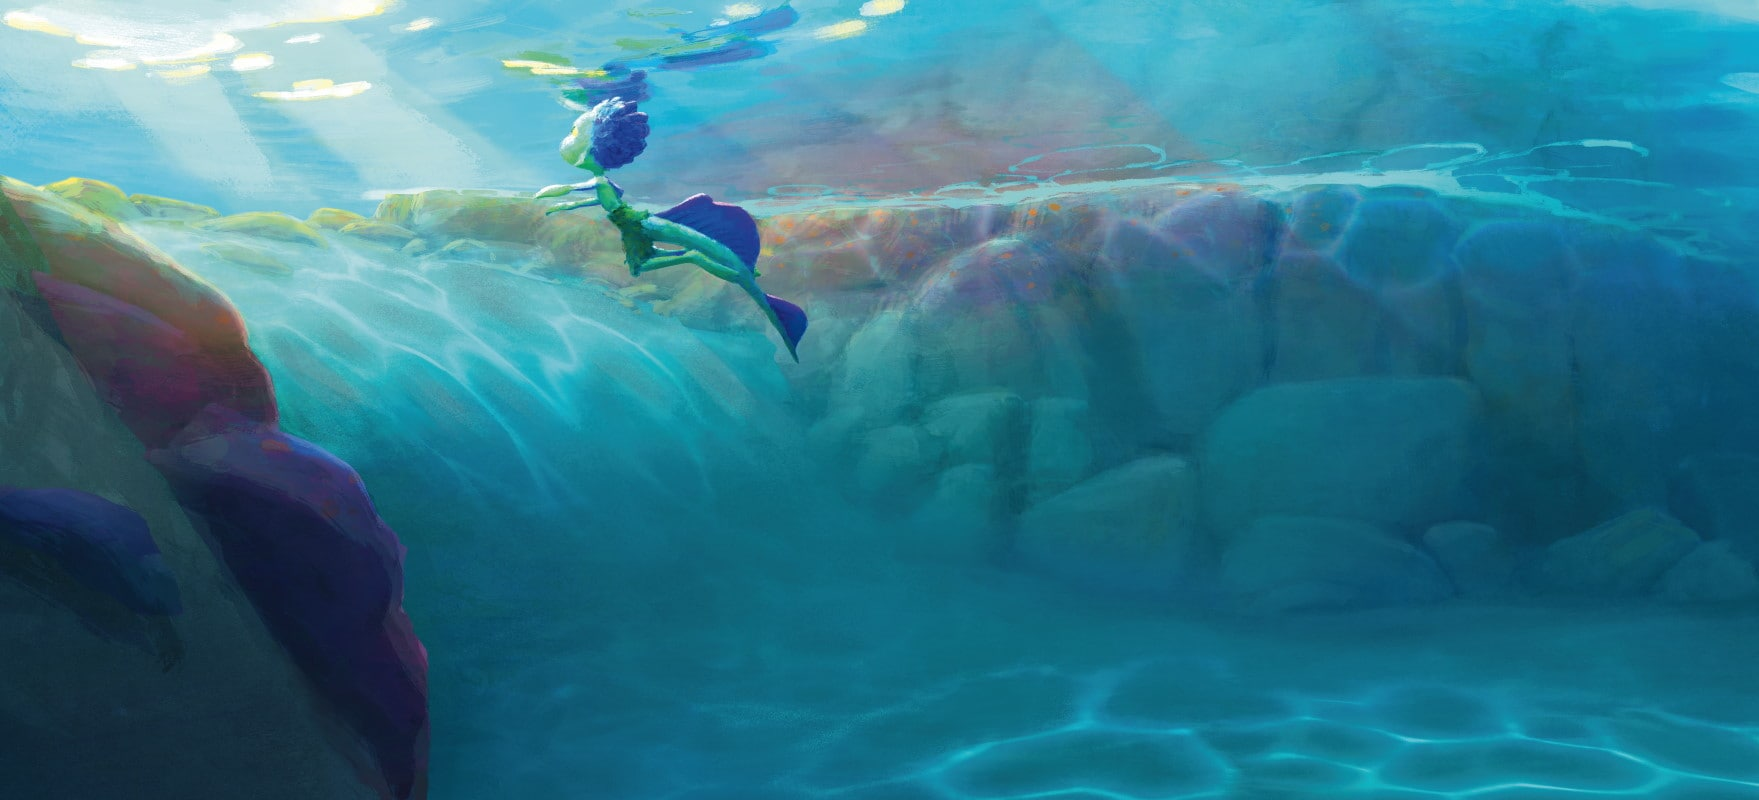 luca underwater light luca pixar movie